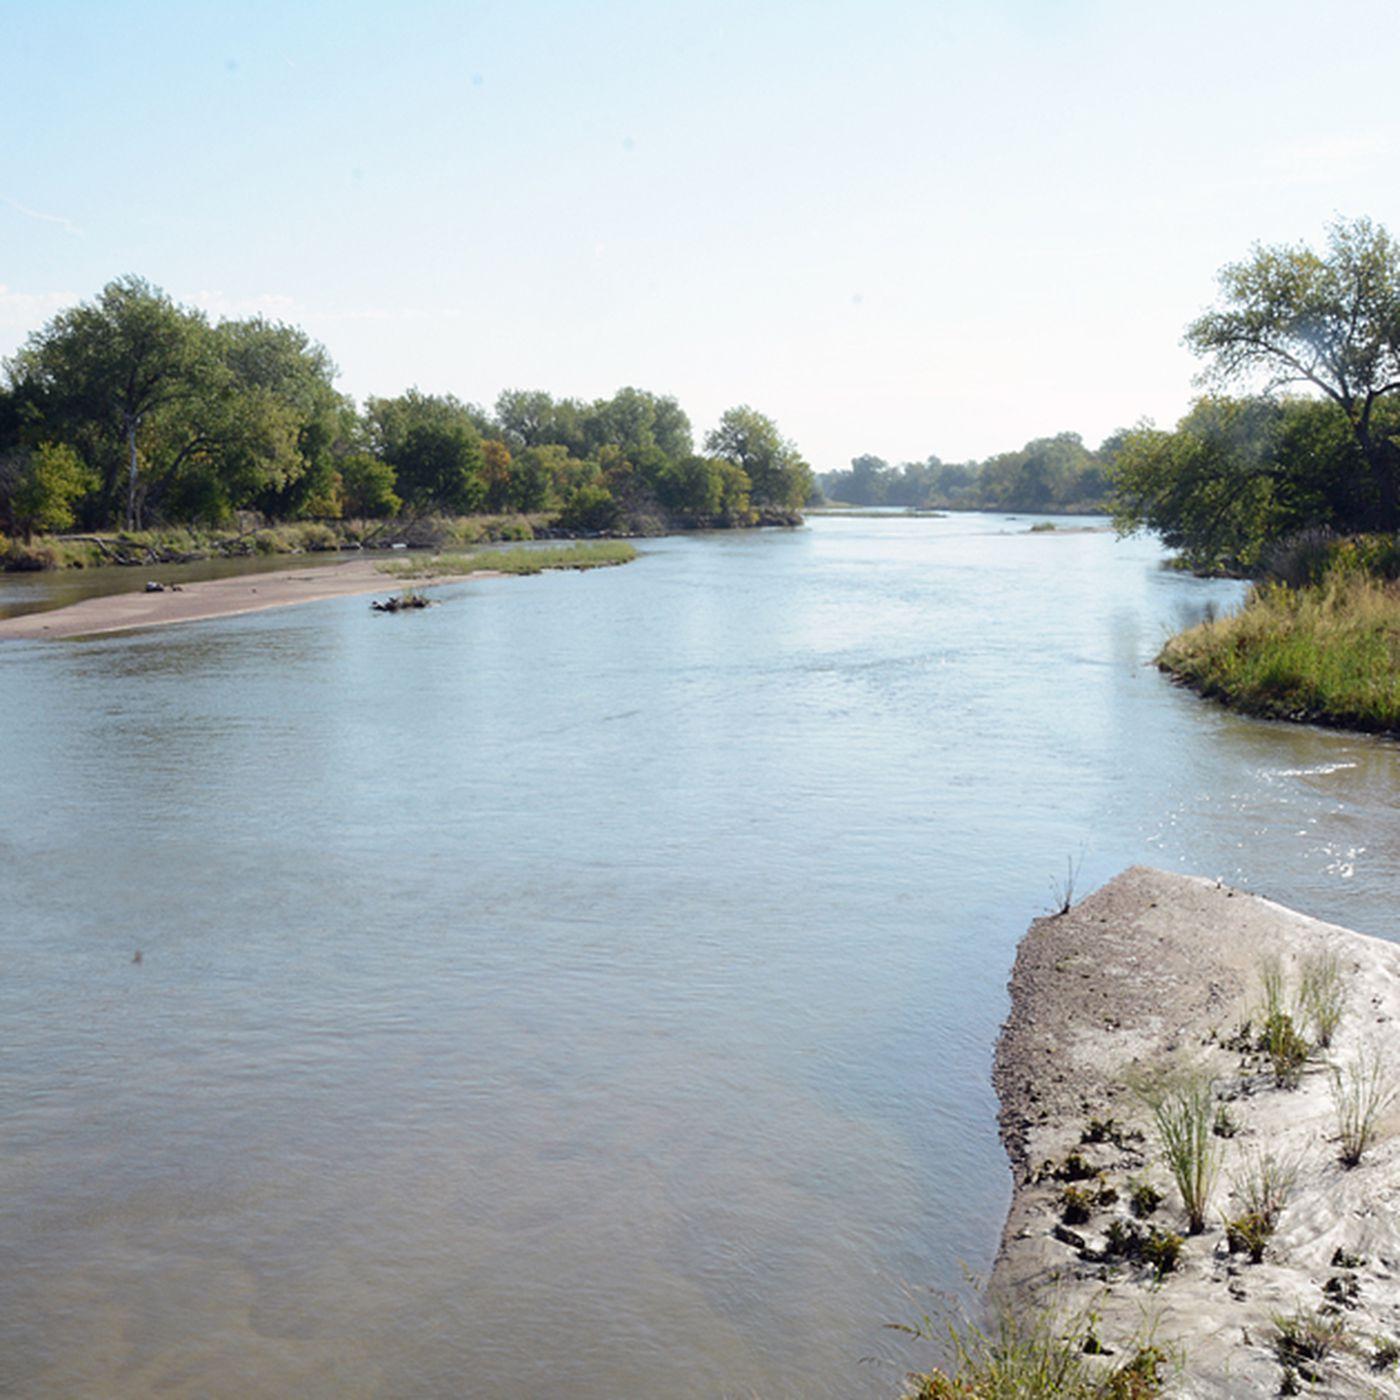 Picturing history: The Platte River, Nebraska - Deseret News